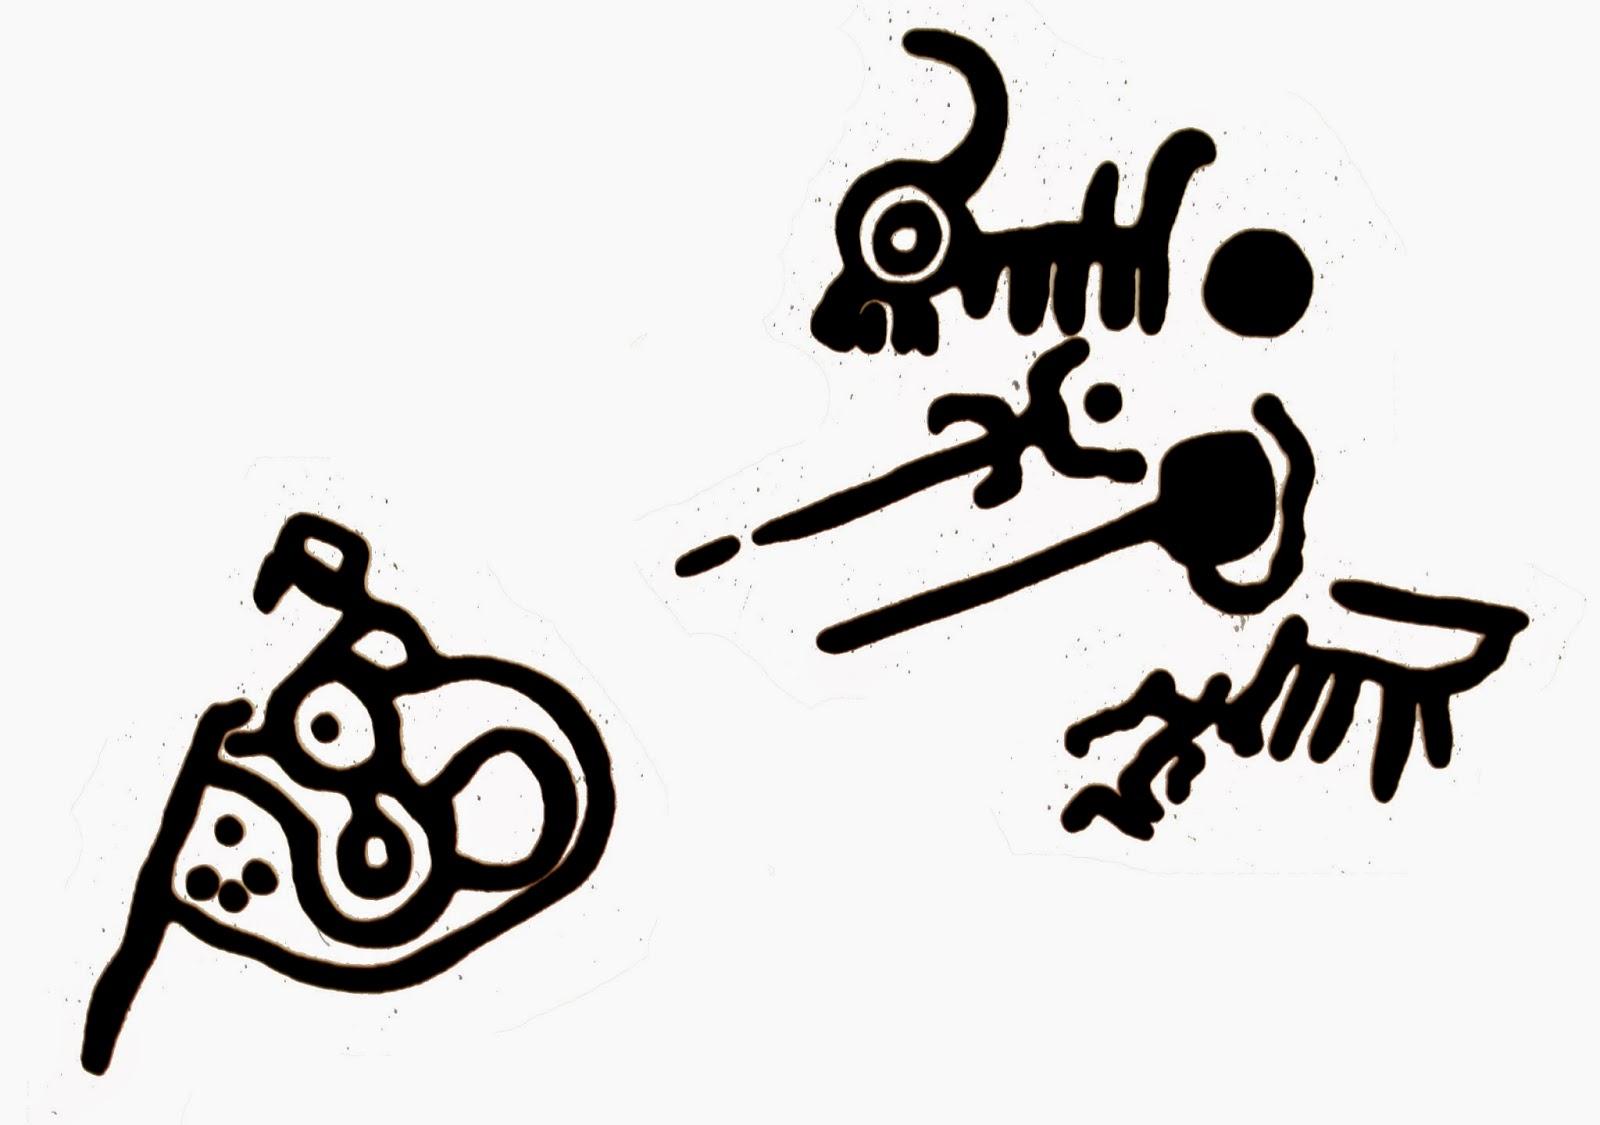 Petroglifos De Galicia